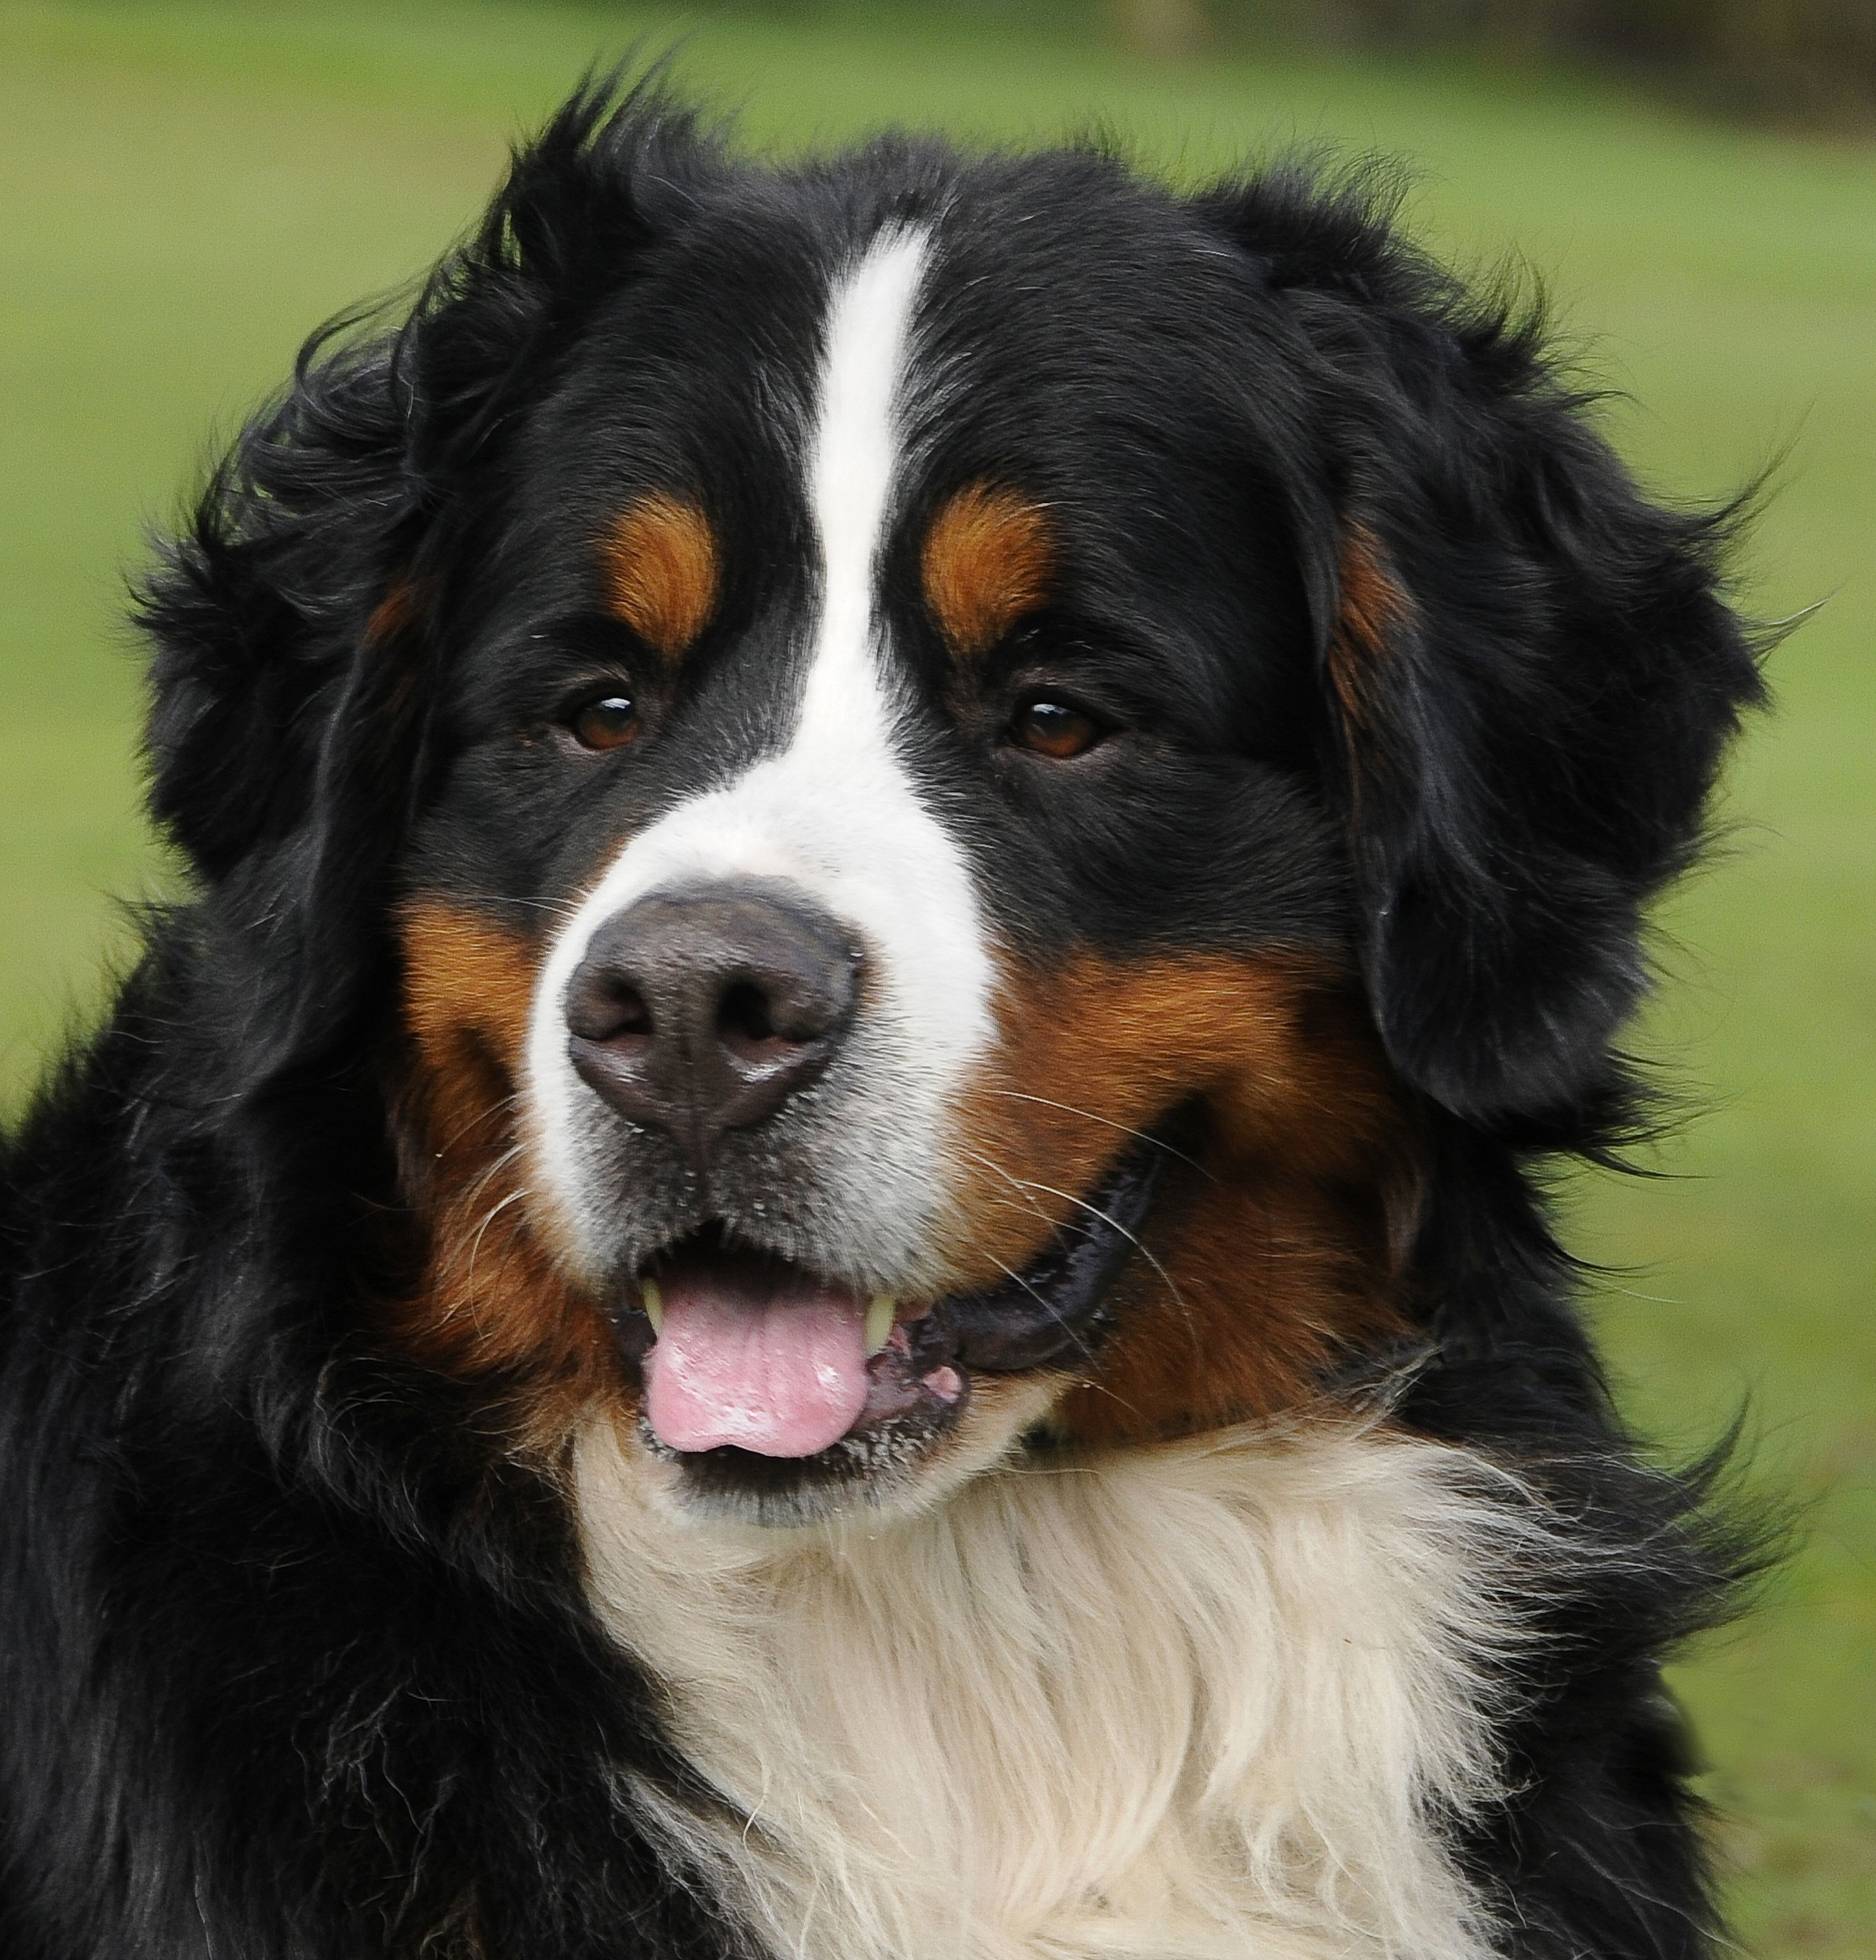 bernese mountain dog face just like it pinterest bernese mountain dogs. Black Bedroom Furniture Sets. Home Design Ideas